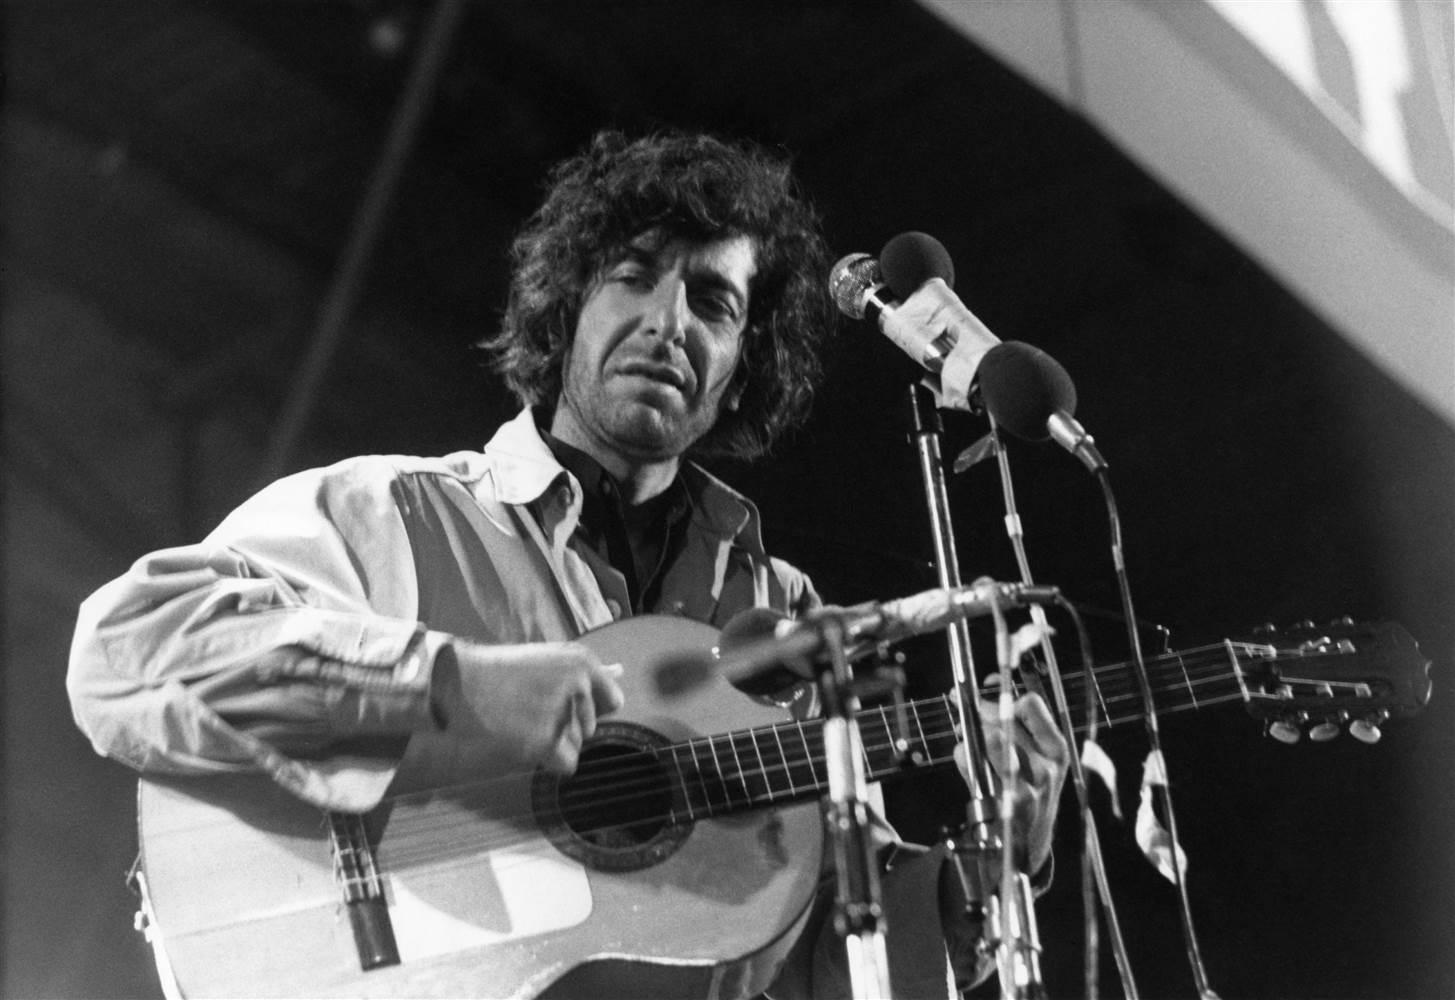 You are currently viewing Romantik Devrimci Leonard Cohen fiziksel yaşama olgunlukla veda etti.